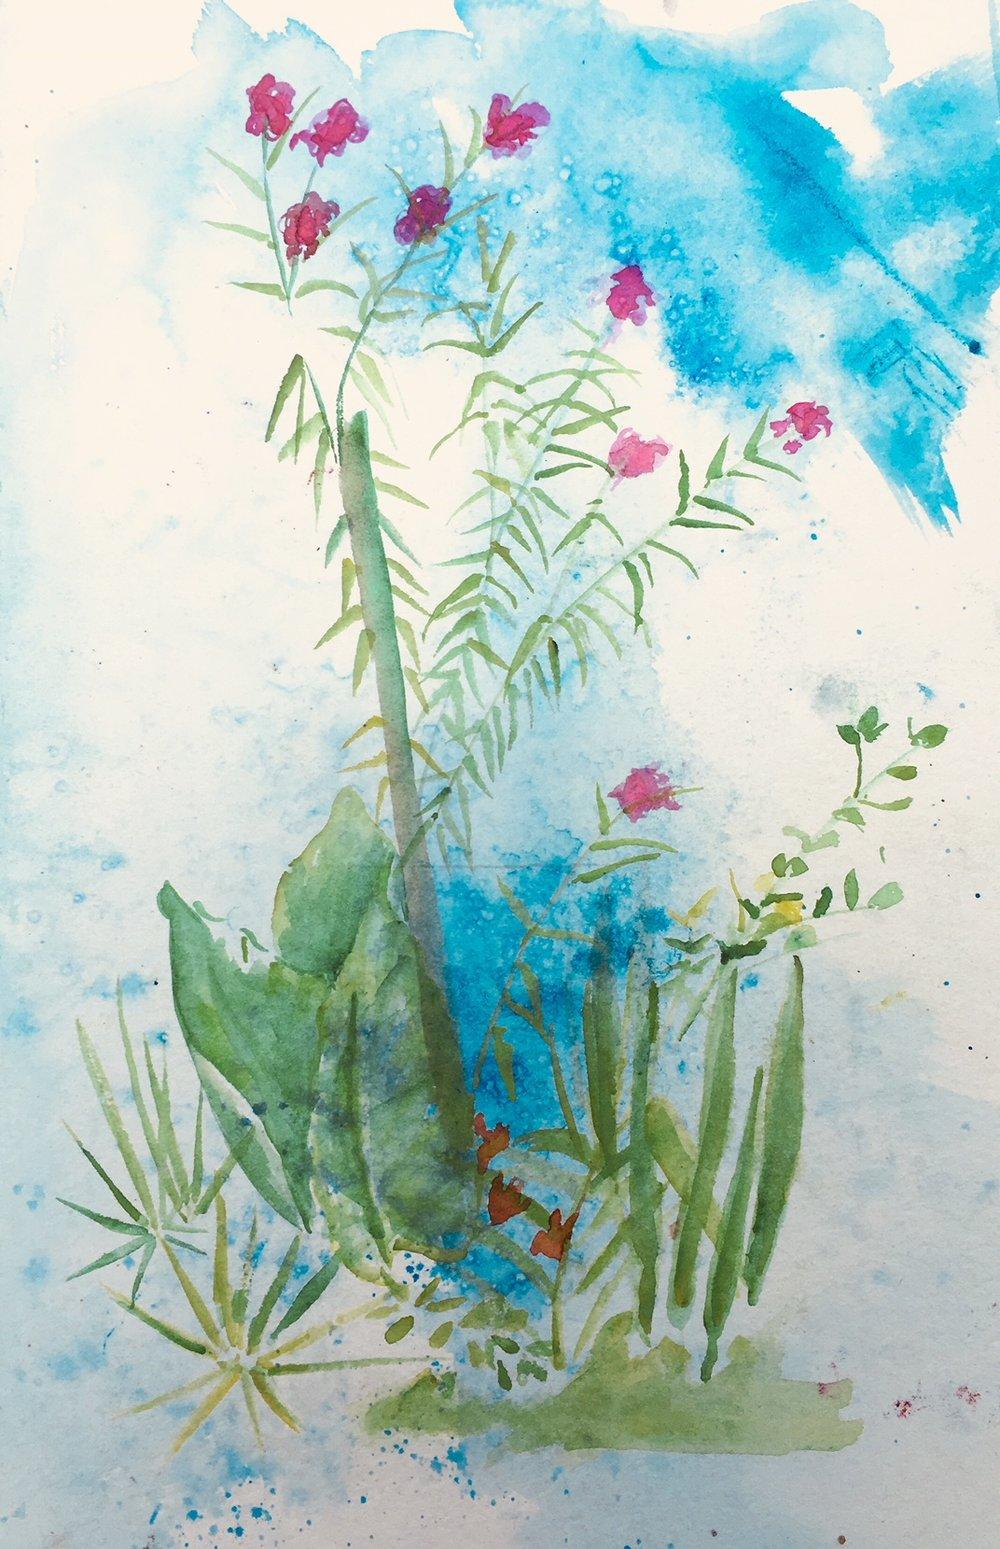 Miss Buela's Garden - salt-scrubbed watercolor